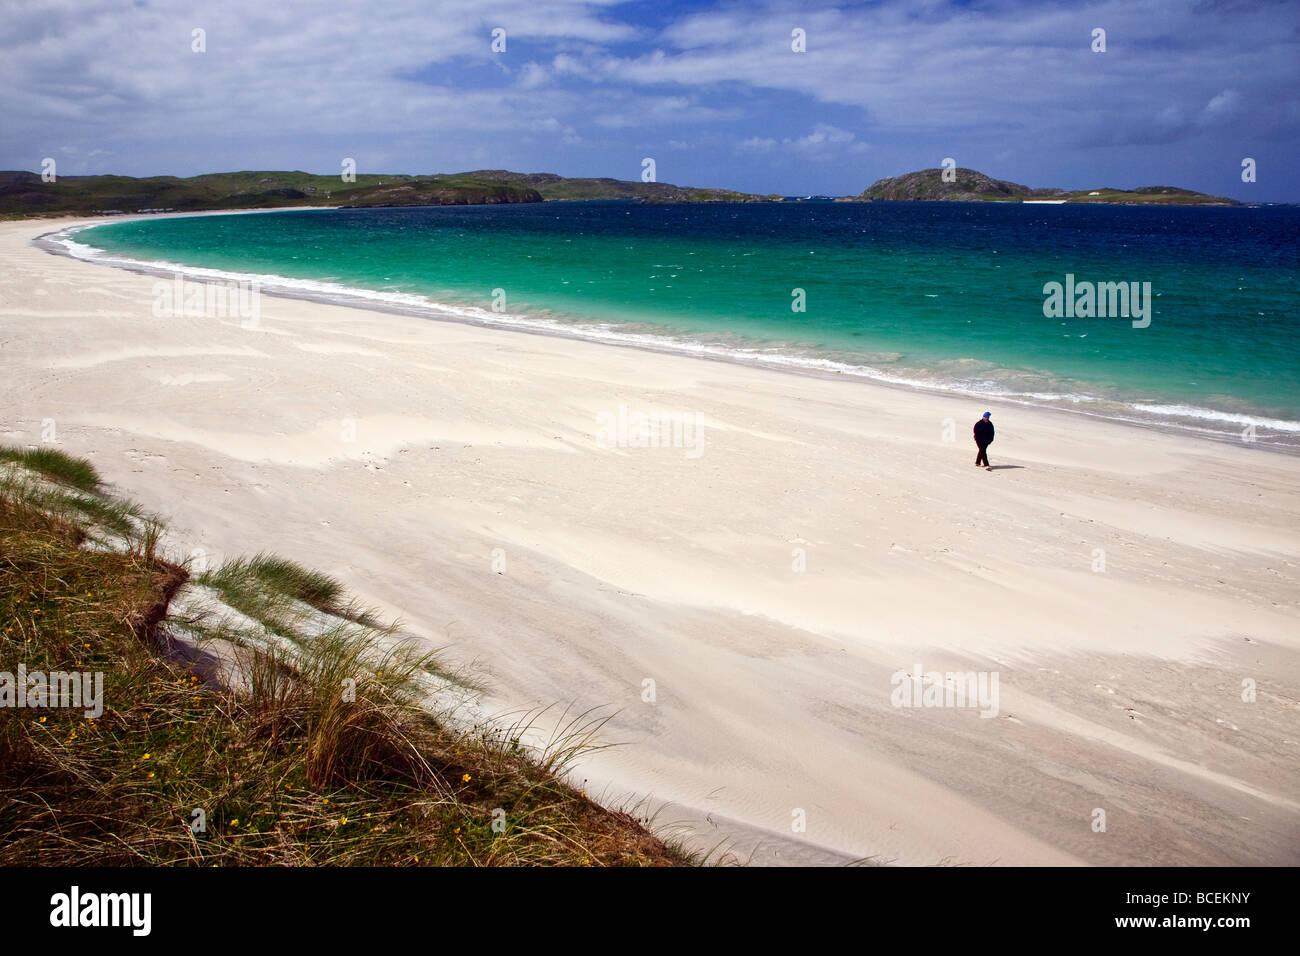 Reef Beach Isle of Lewis, Outer Hebrides, Western Isles, Scotland UK 2009 - Stock Image